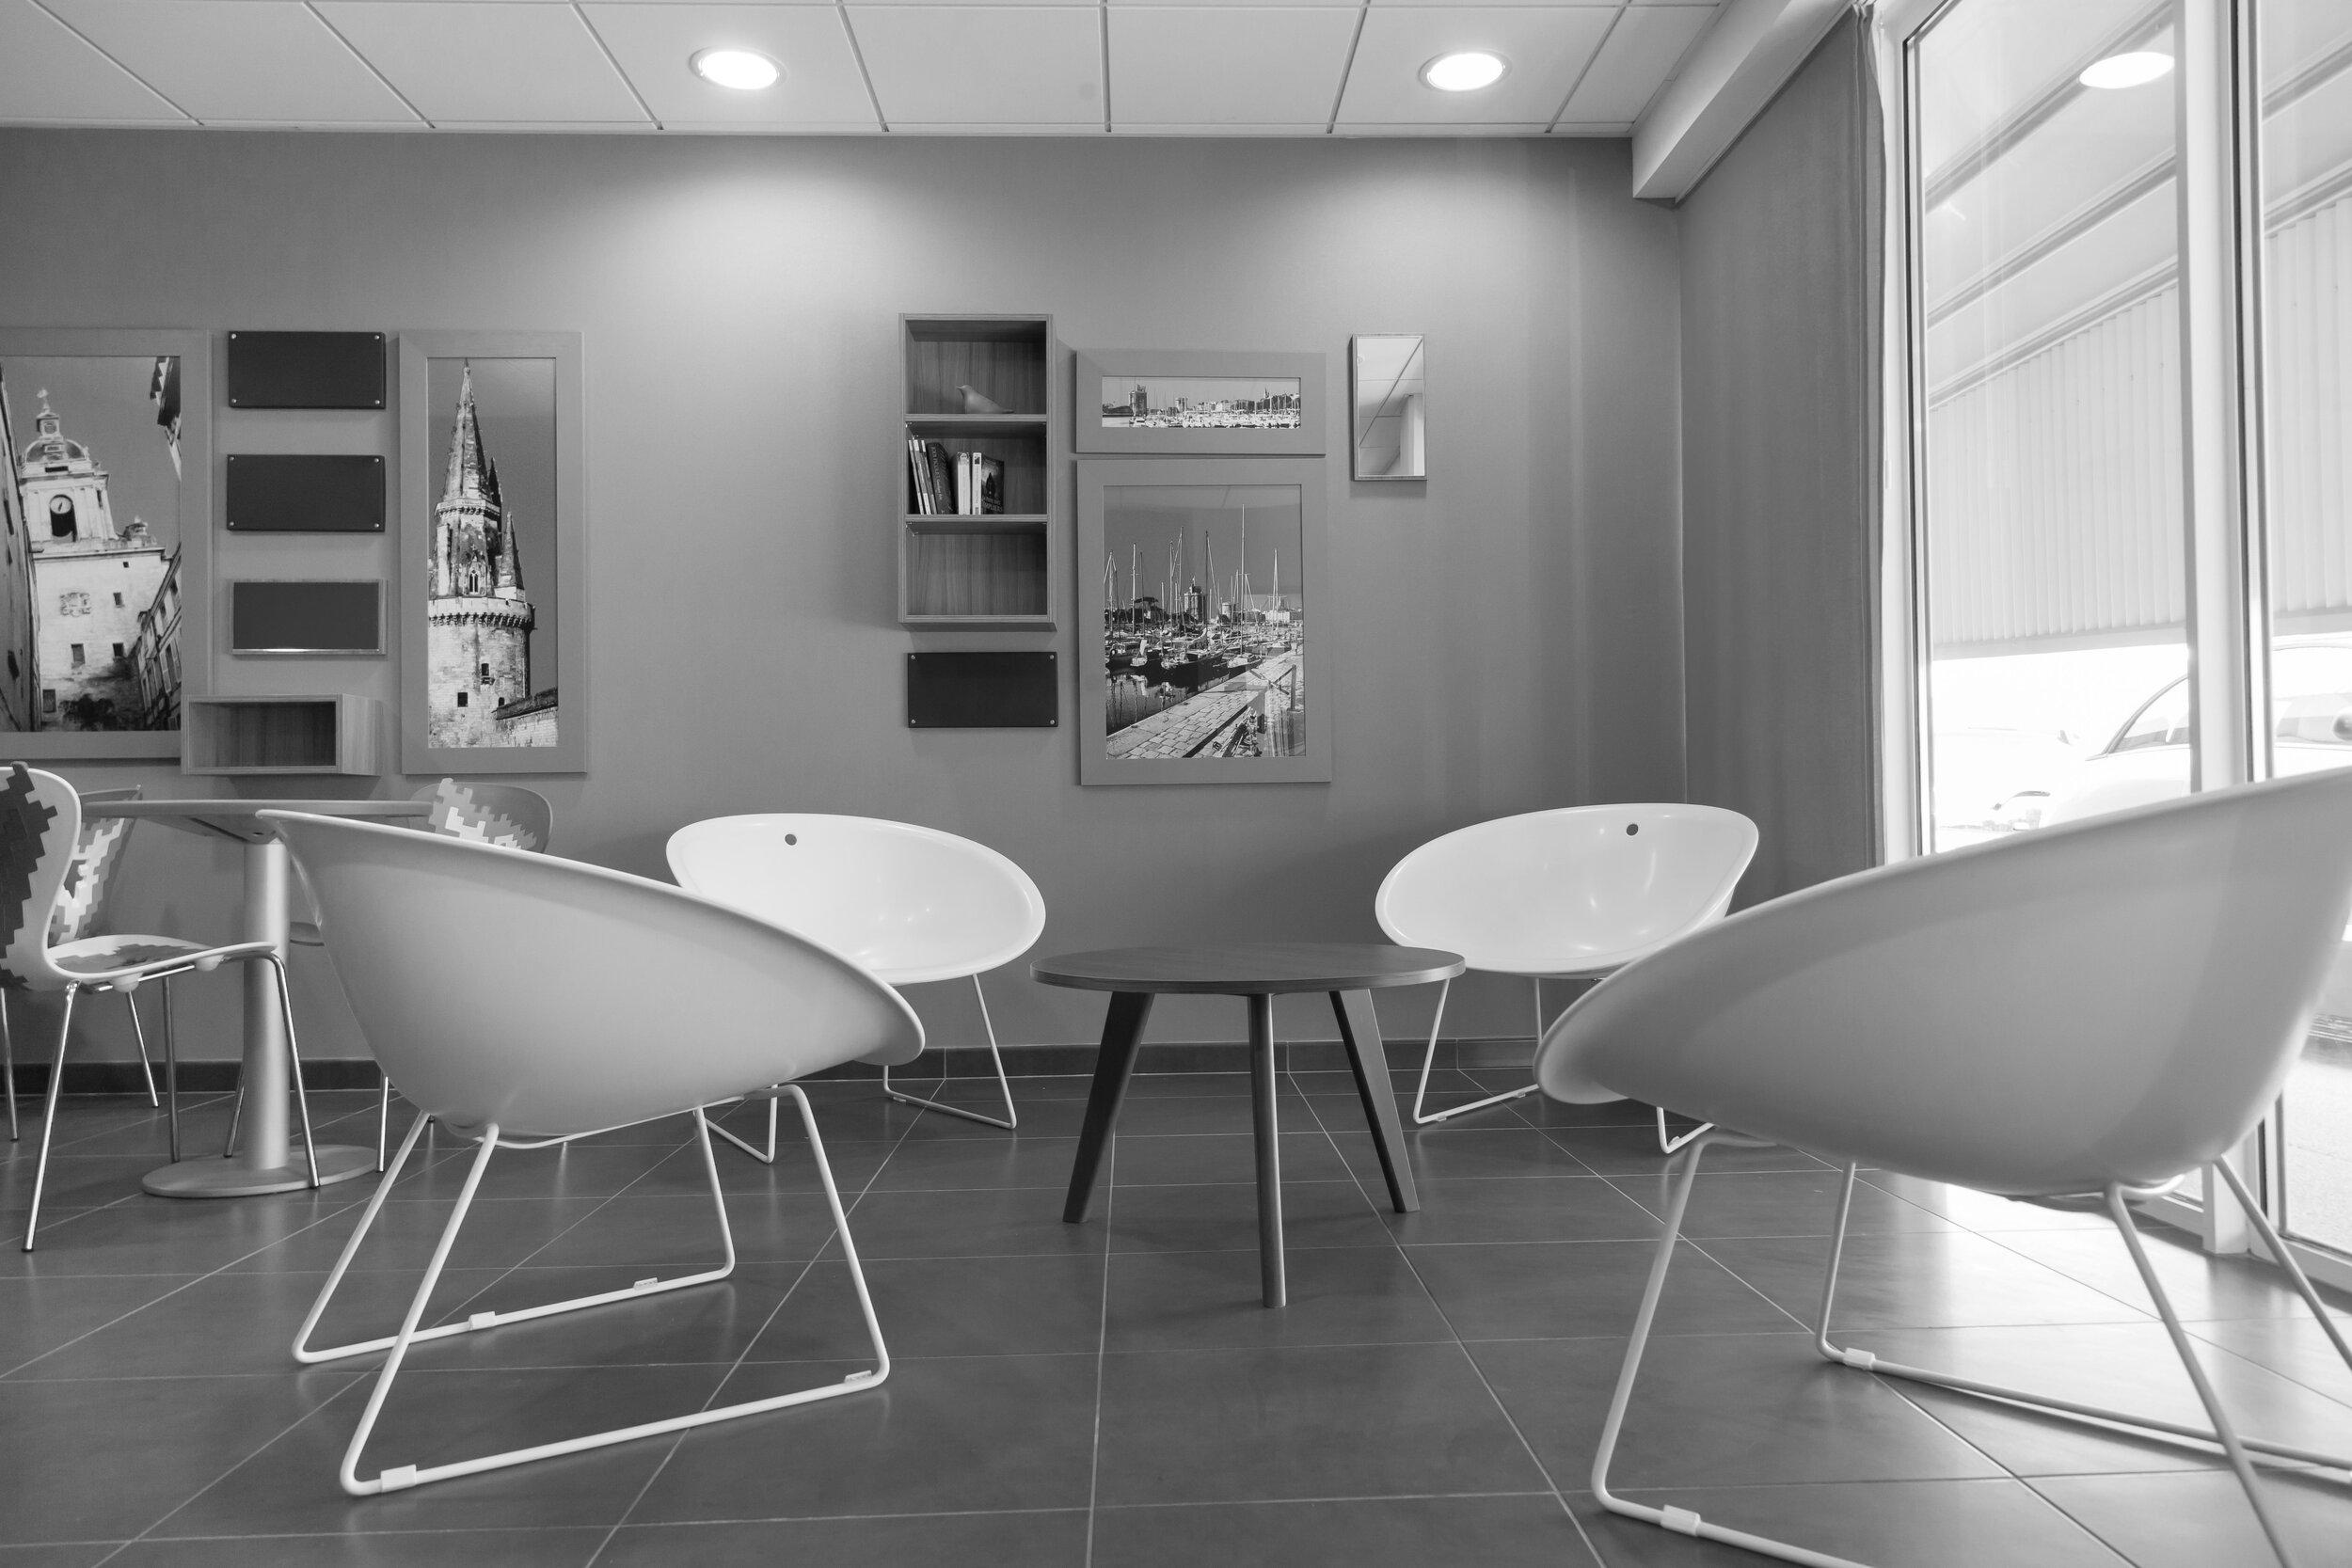 residence-etudiante-la-rochelle-salle-commune.jpg